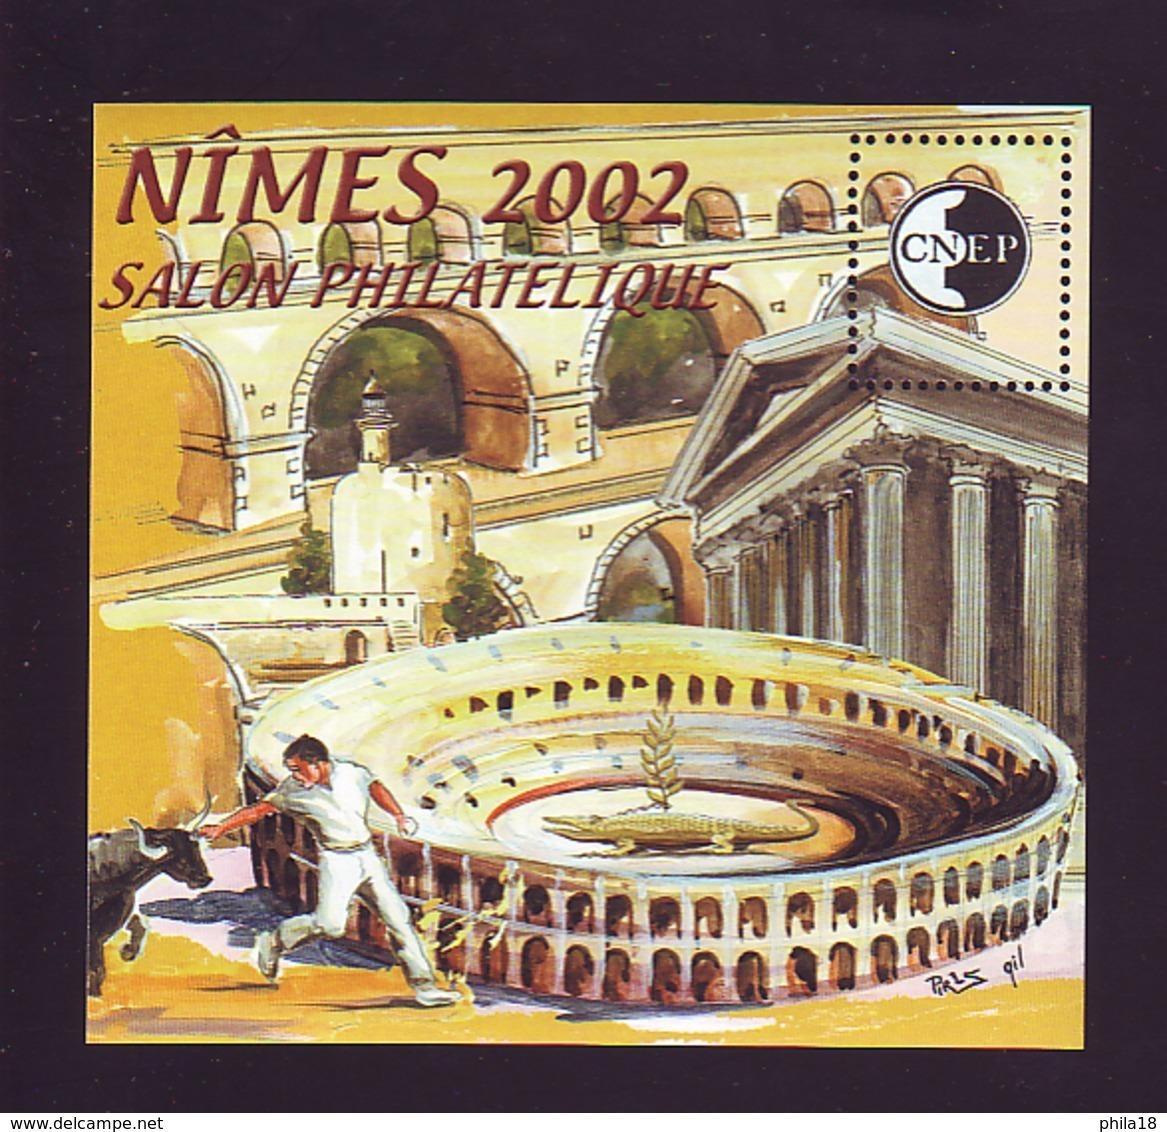 BLOC CNEP 2002 N° 36 - NIMES SALON PHILATELIQUE TOREADOR TAUREAU - CNEP